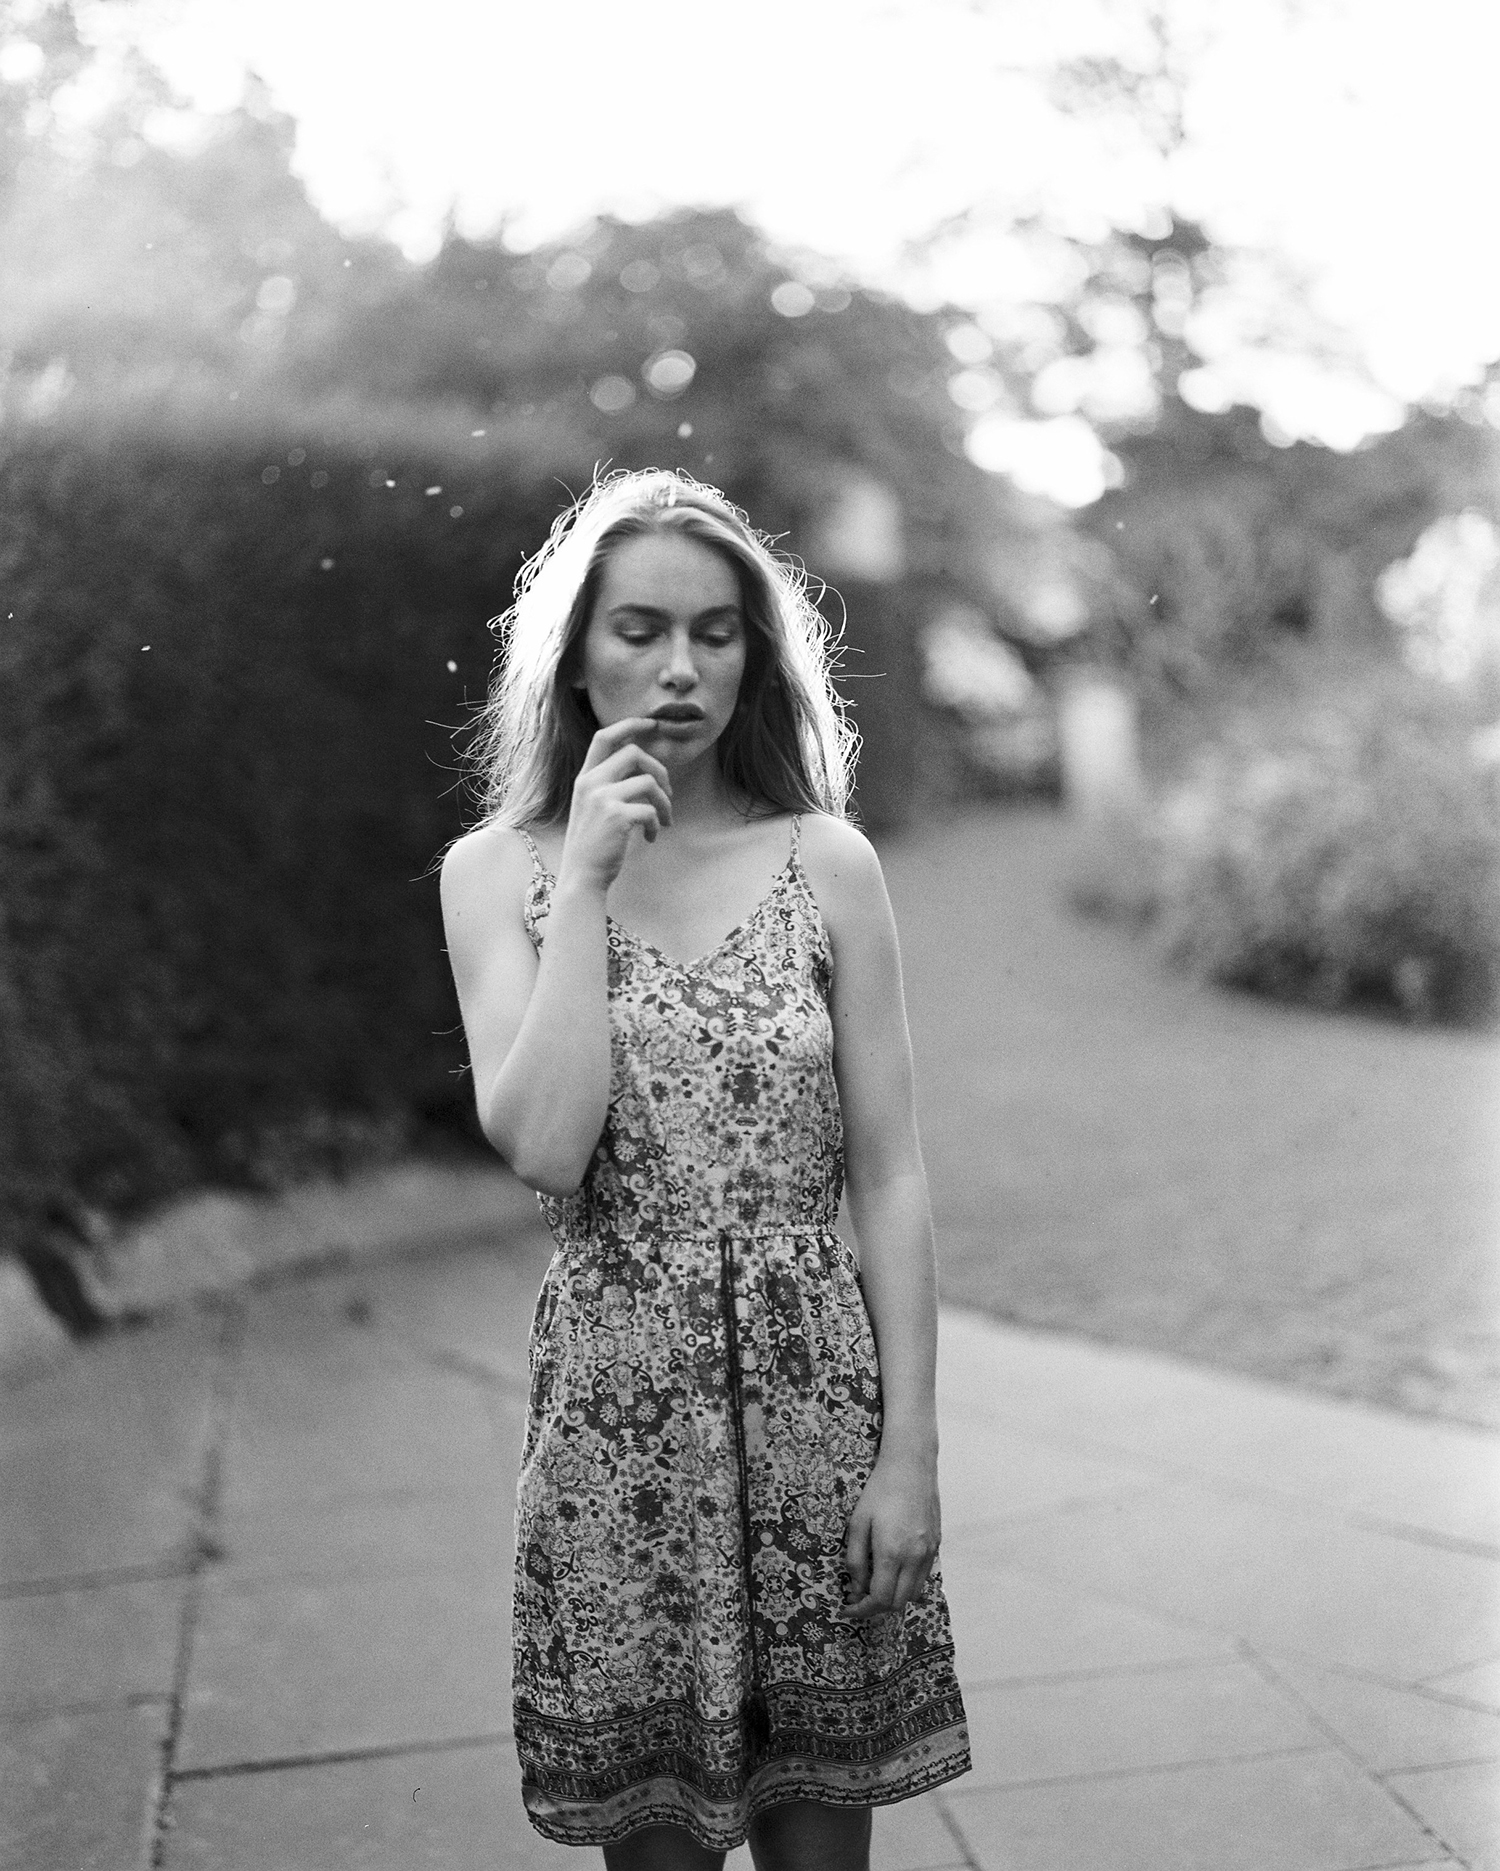 Shoot in Regents Park London by Dmitry Serostanov